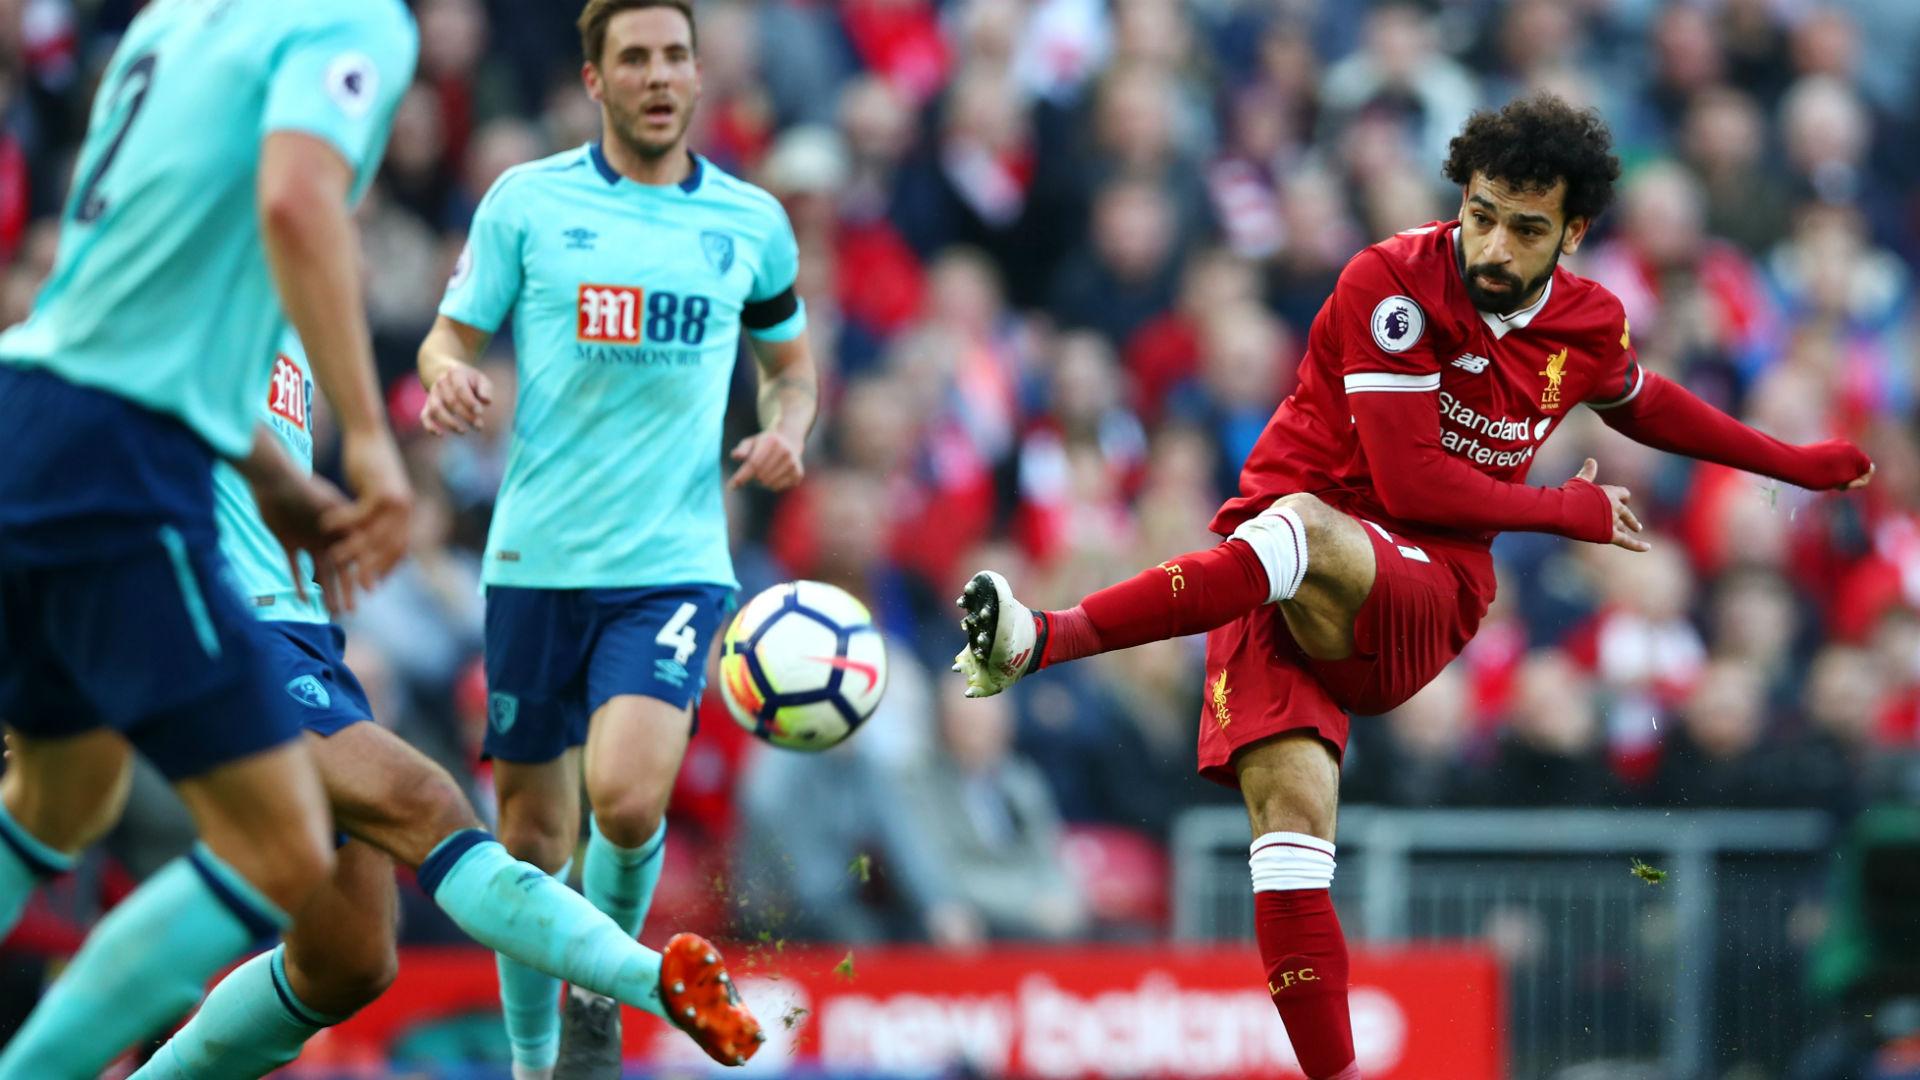 Kane fires defiant message to Mo Salah